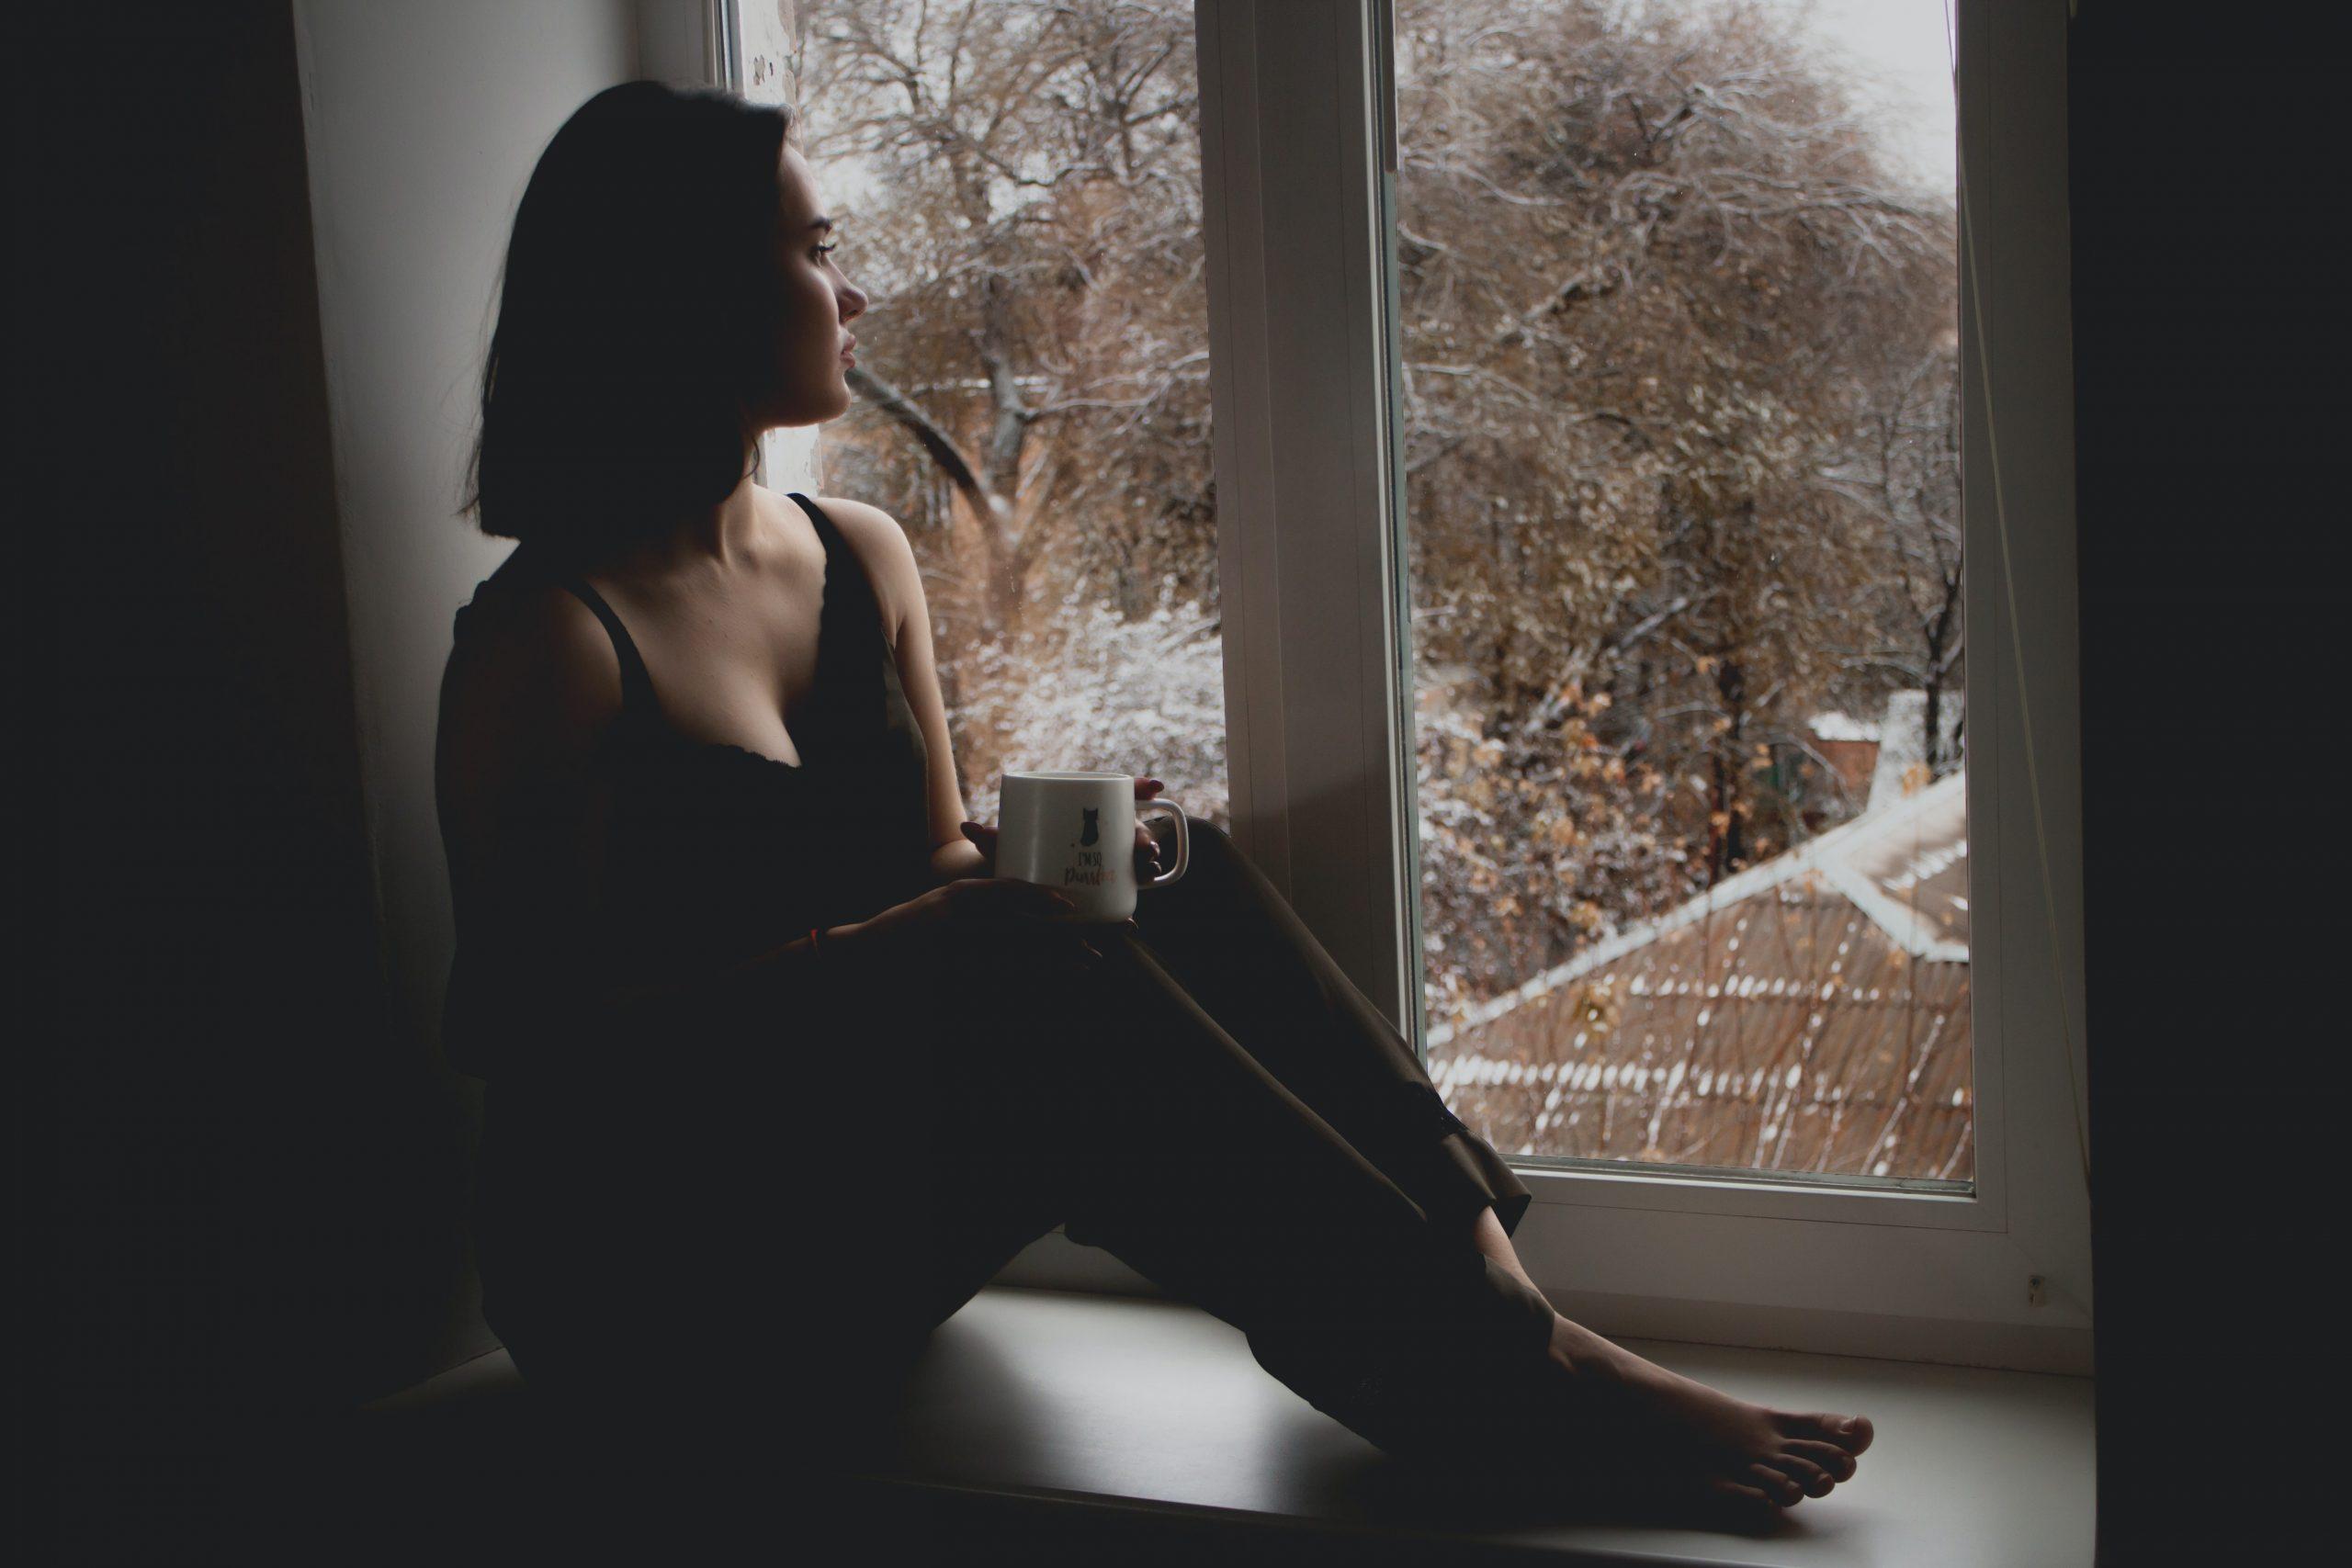 Fata care sta pe pervazul geamului uitandu-se trista afara